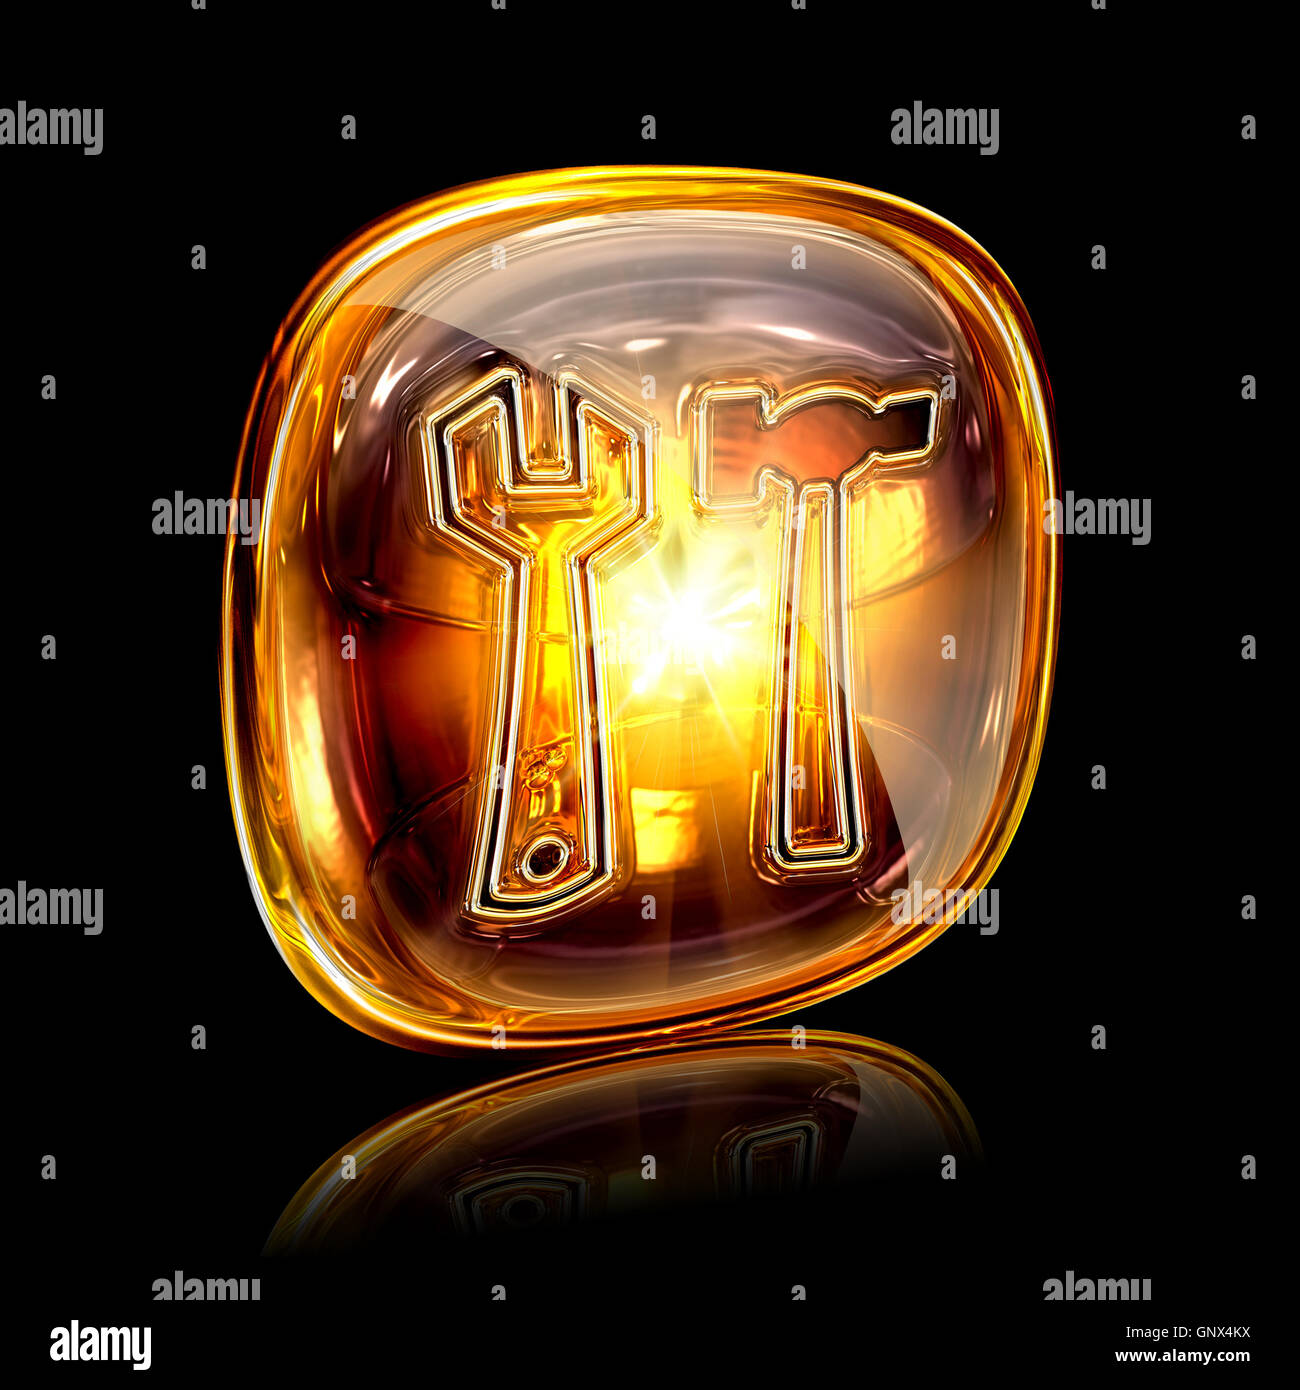 Tools icon amber, isolated on black background - Stock Image